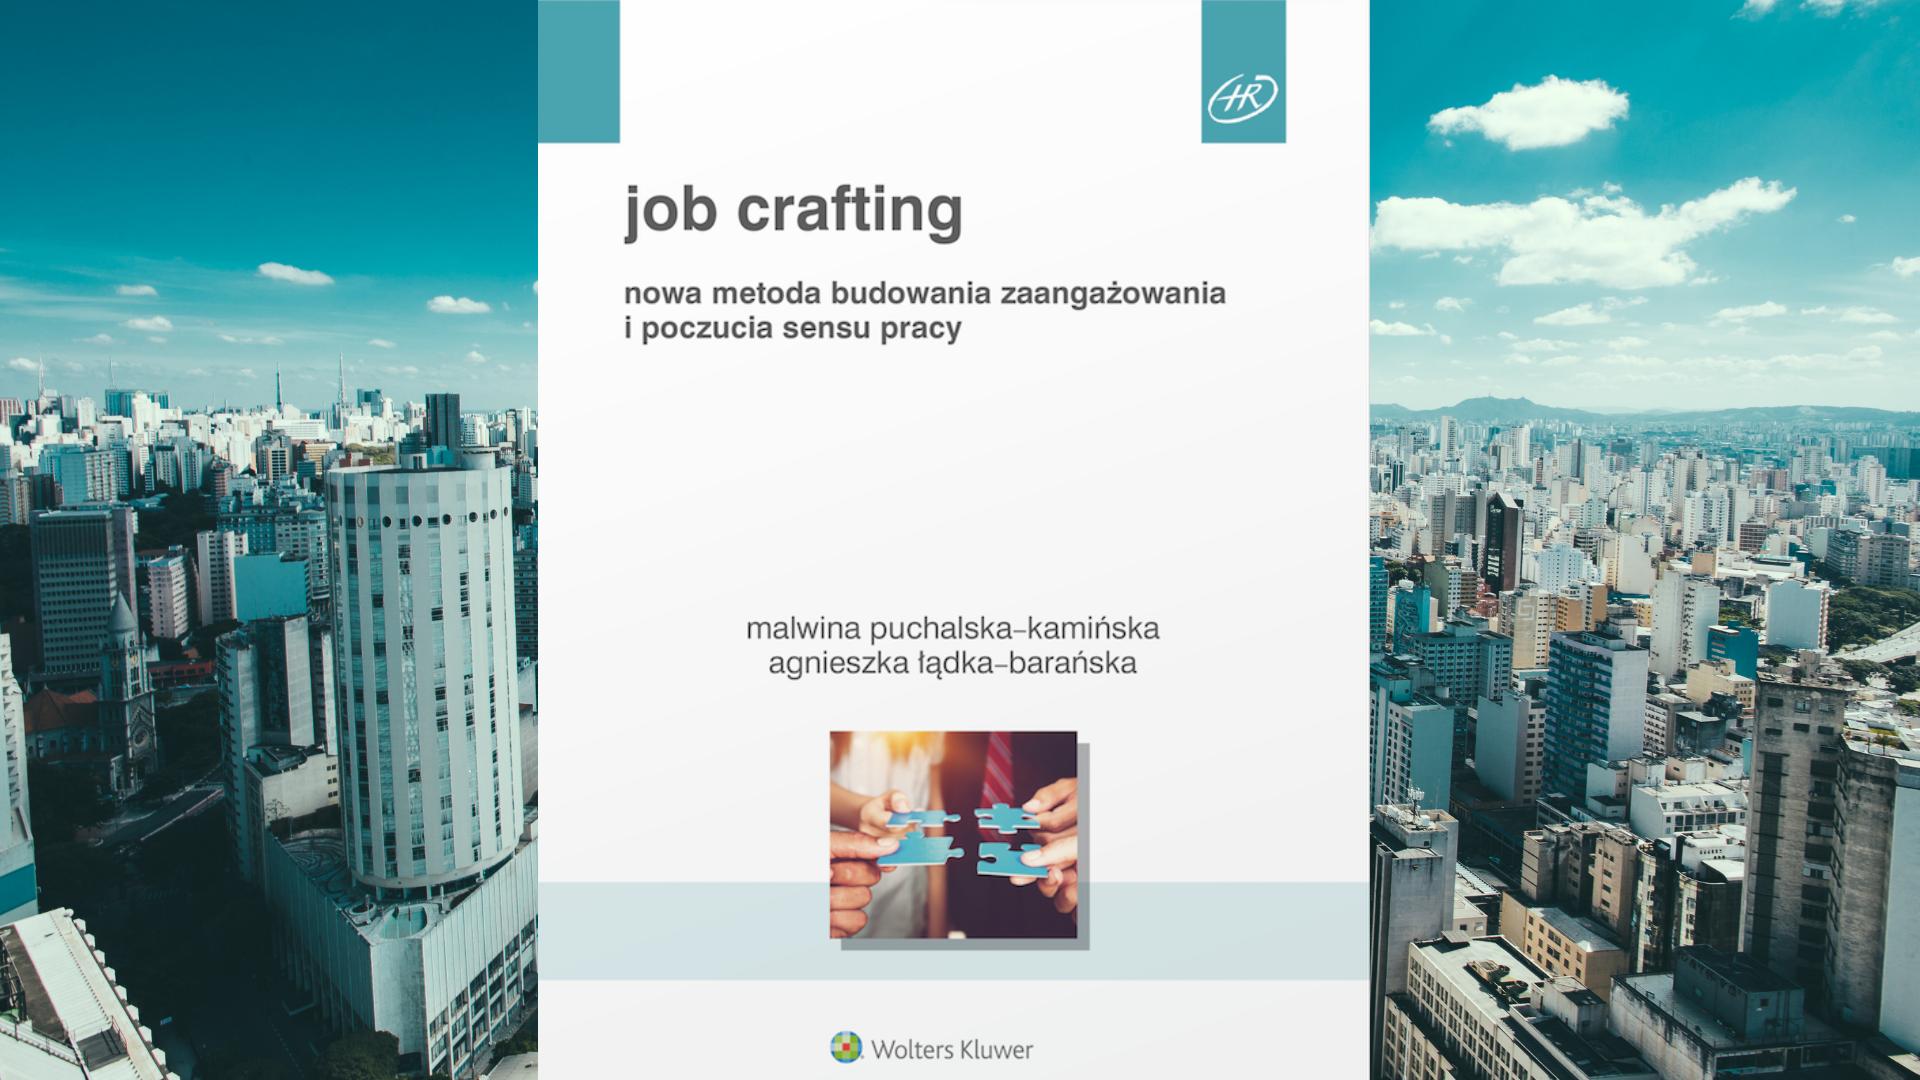 okladka ksiazki _Job crafting